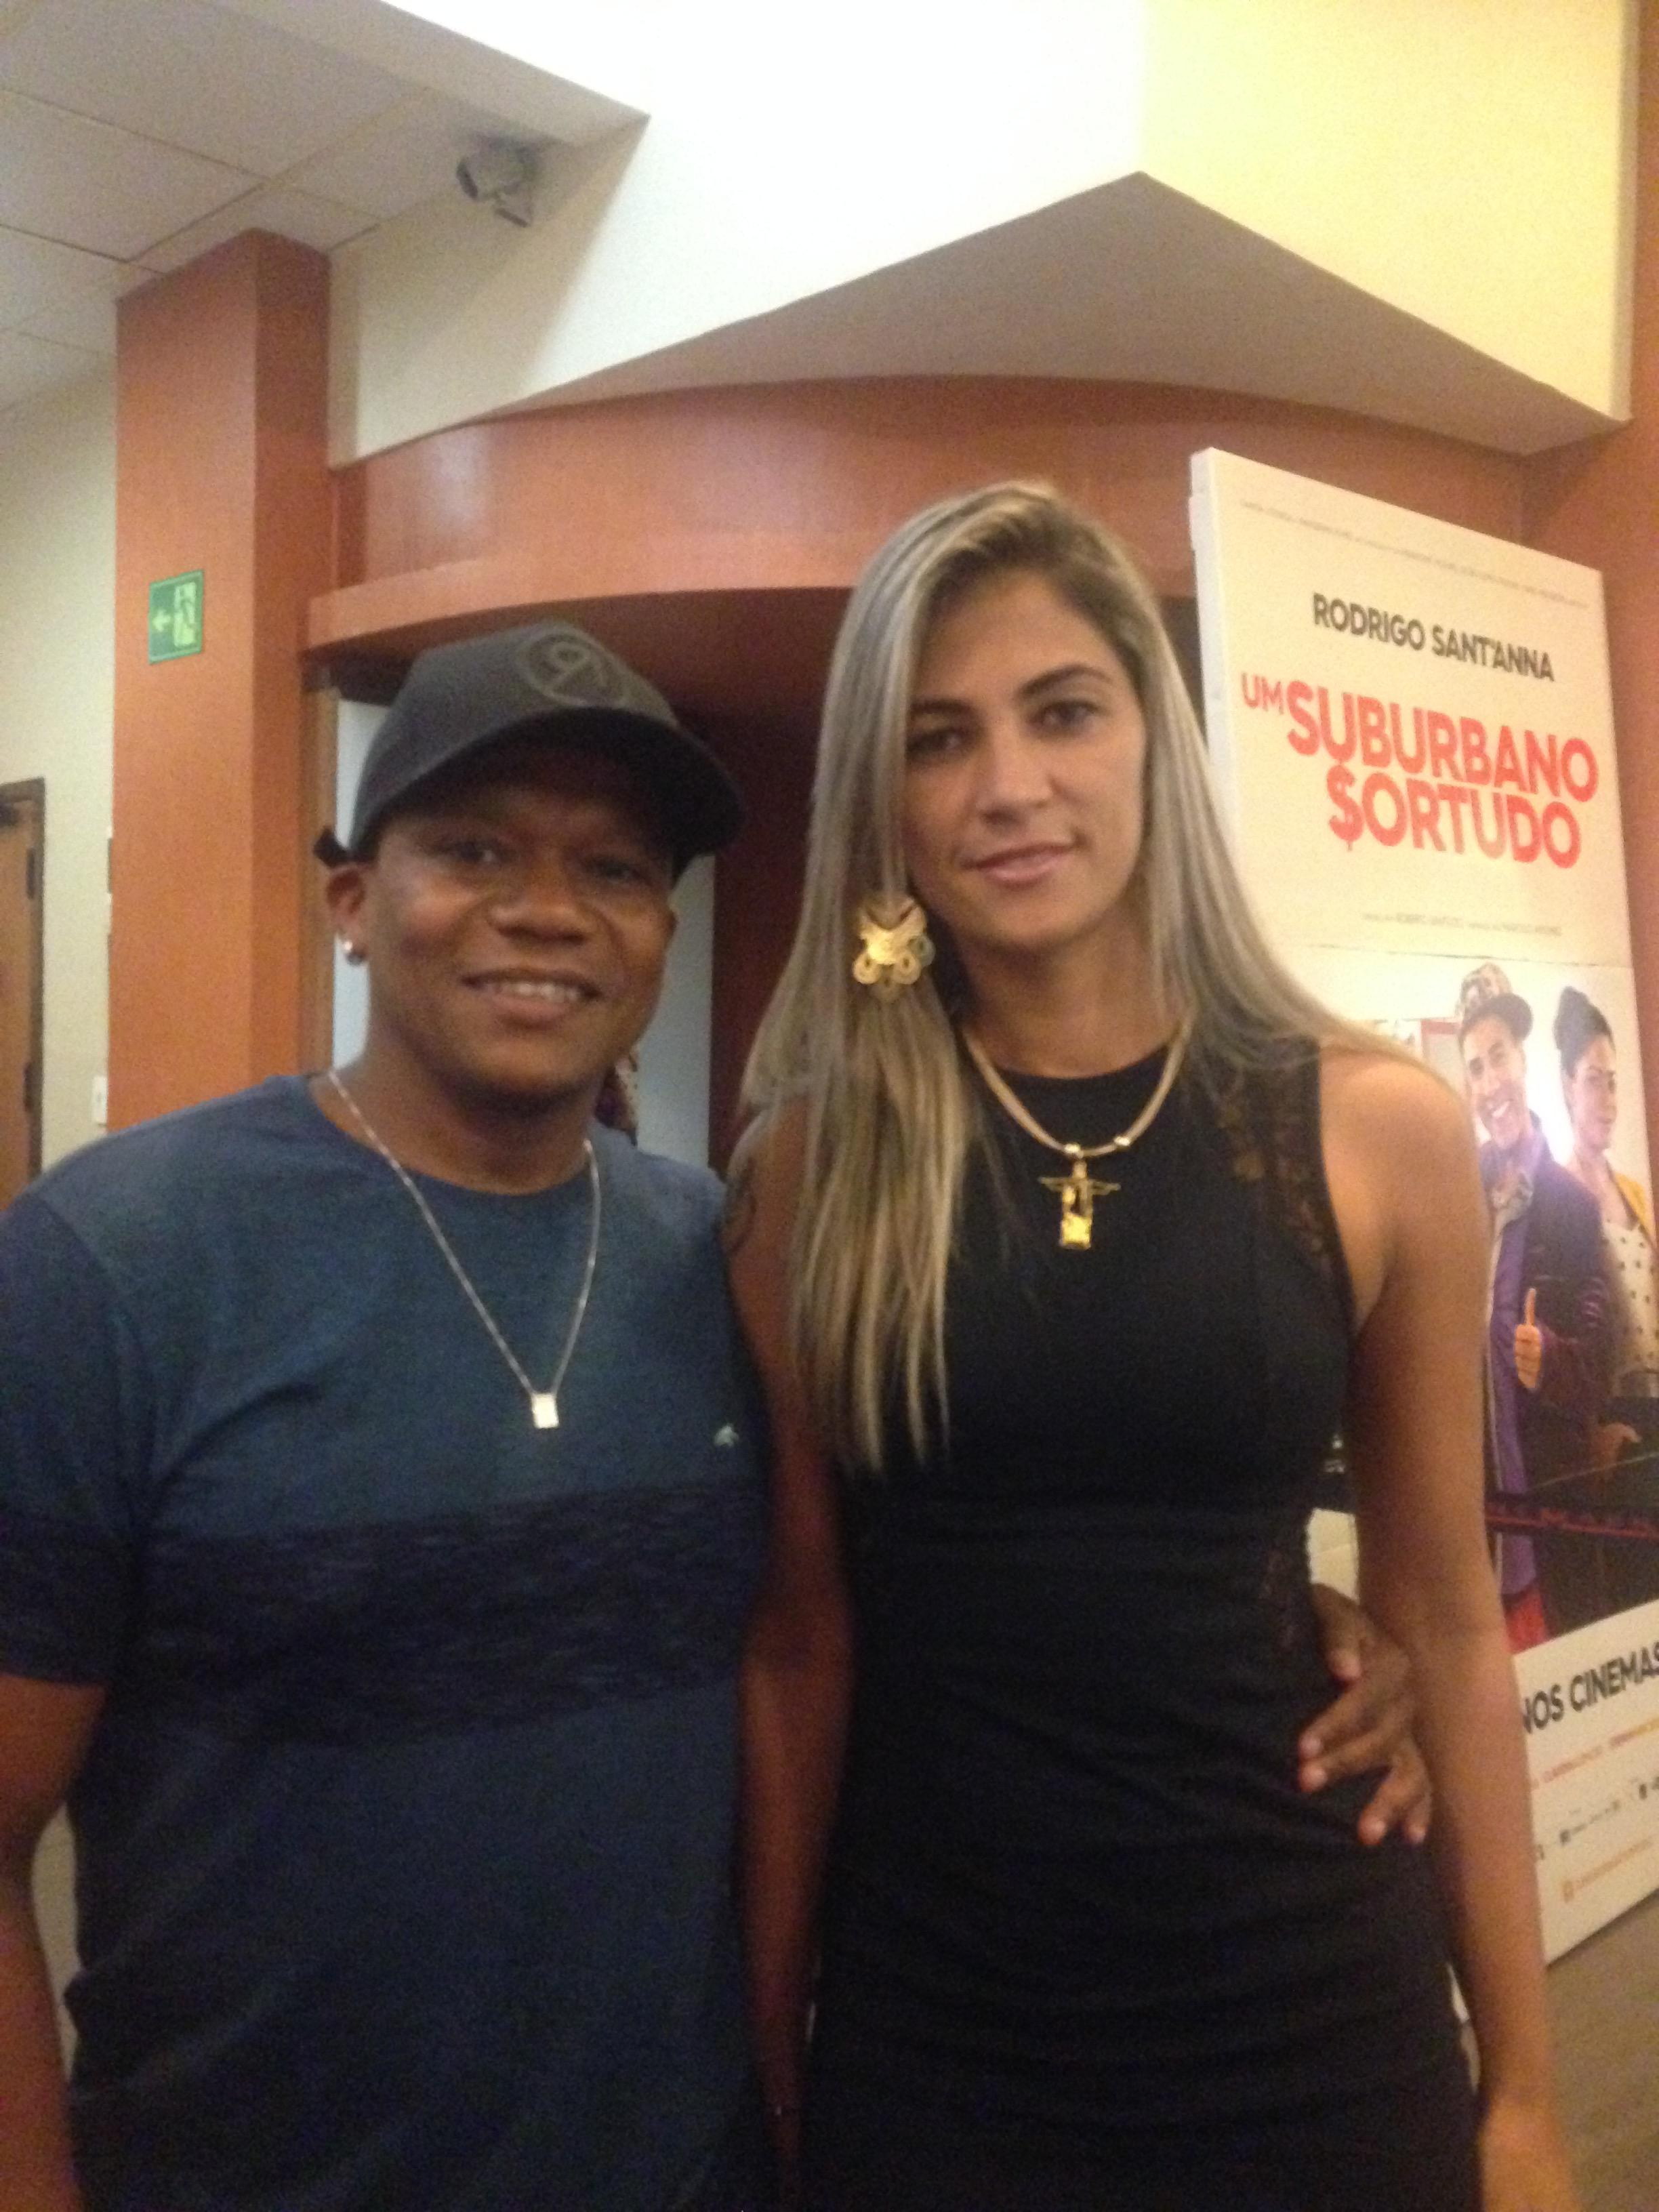 Marivaldo Rodrigues de Almeida e Raquel Camargo